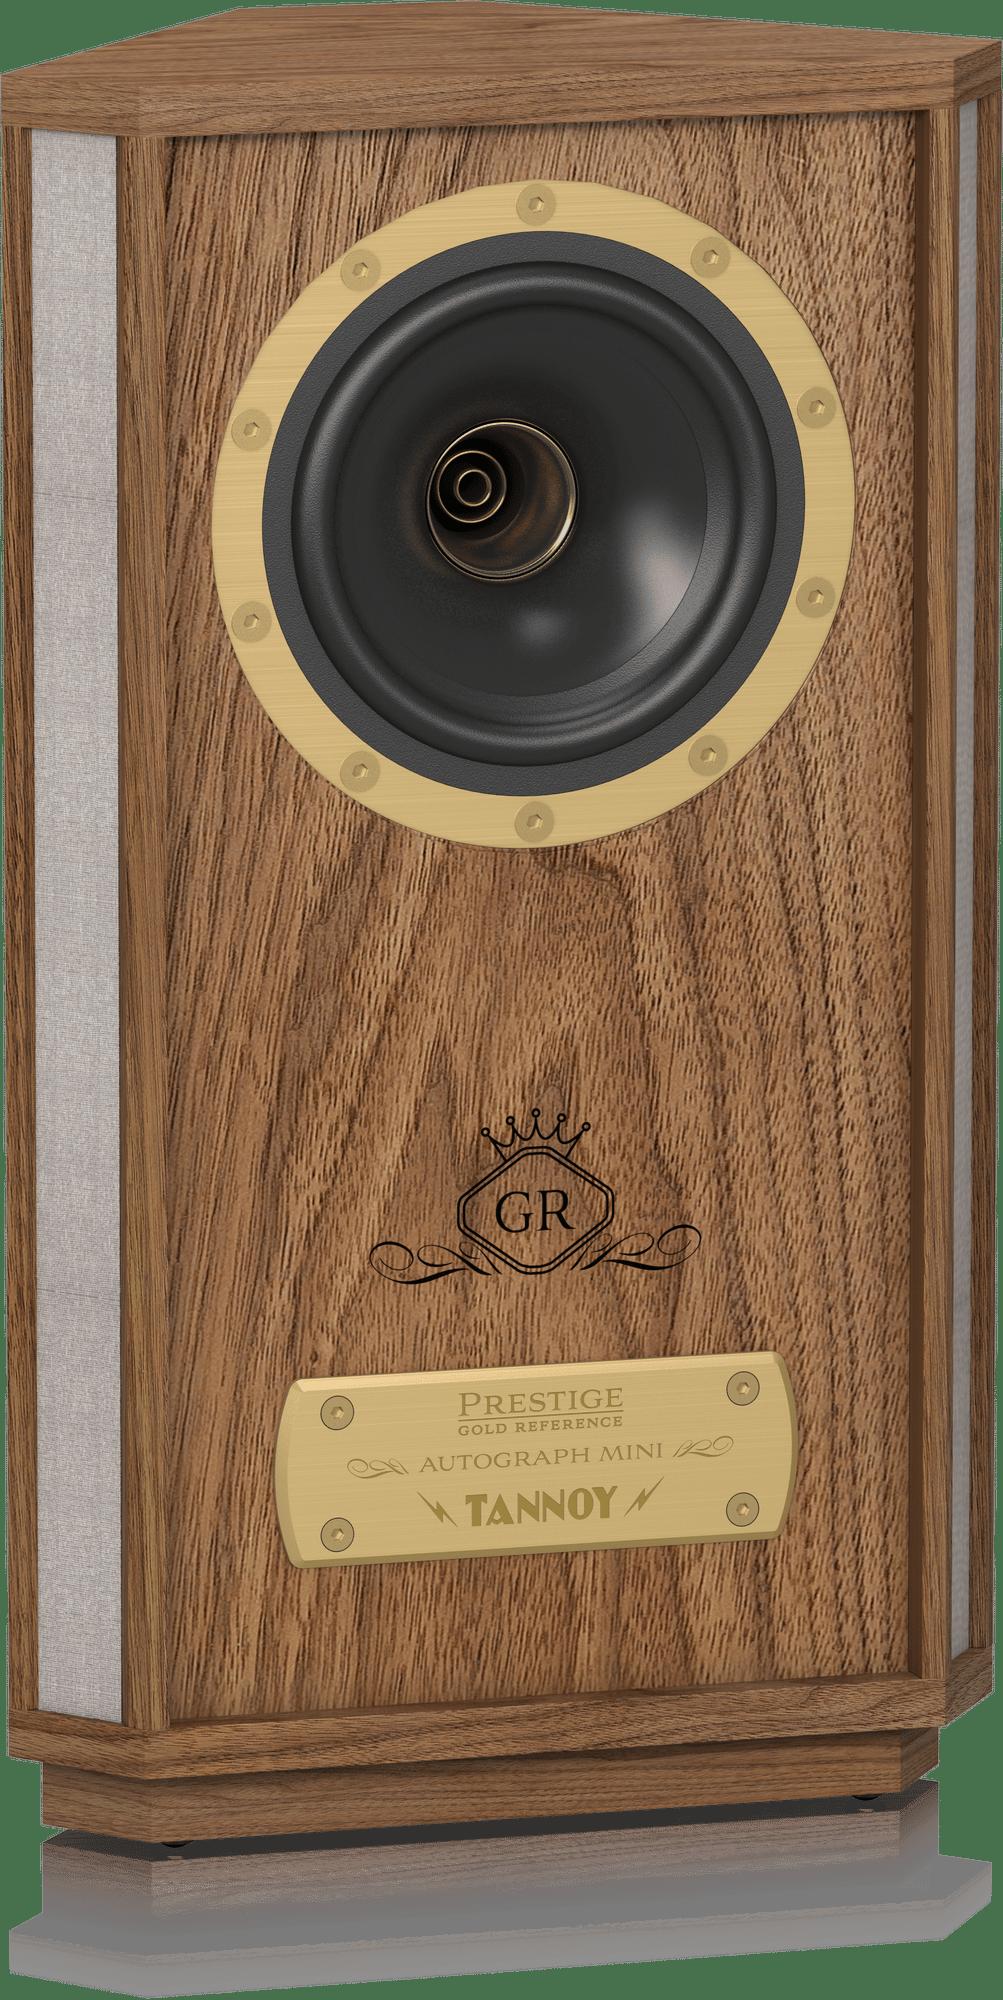 Tannoy Autograph Mini Dual Concentric Speakers